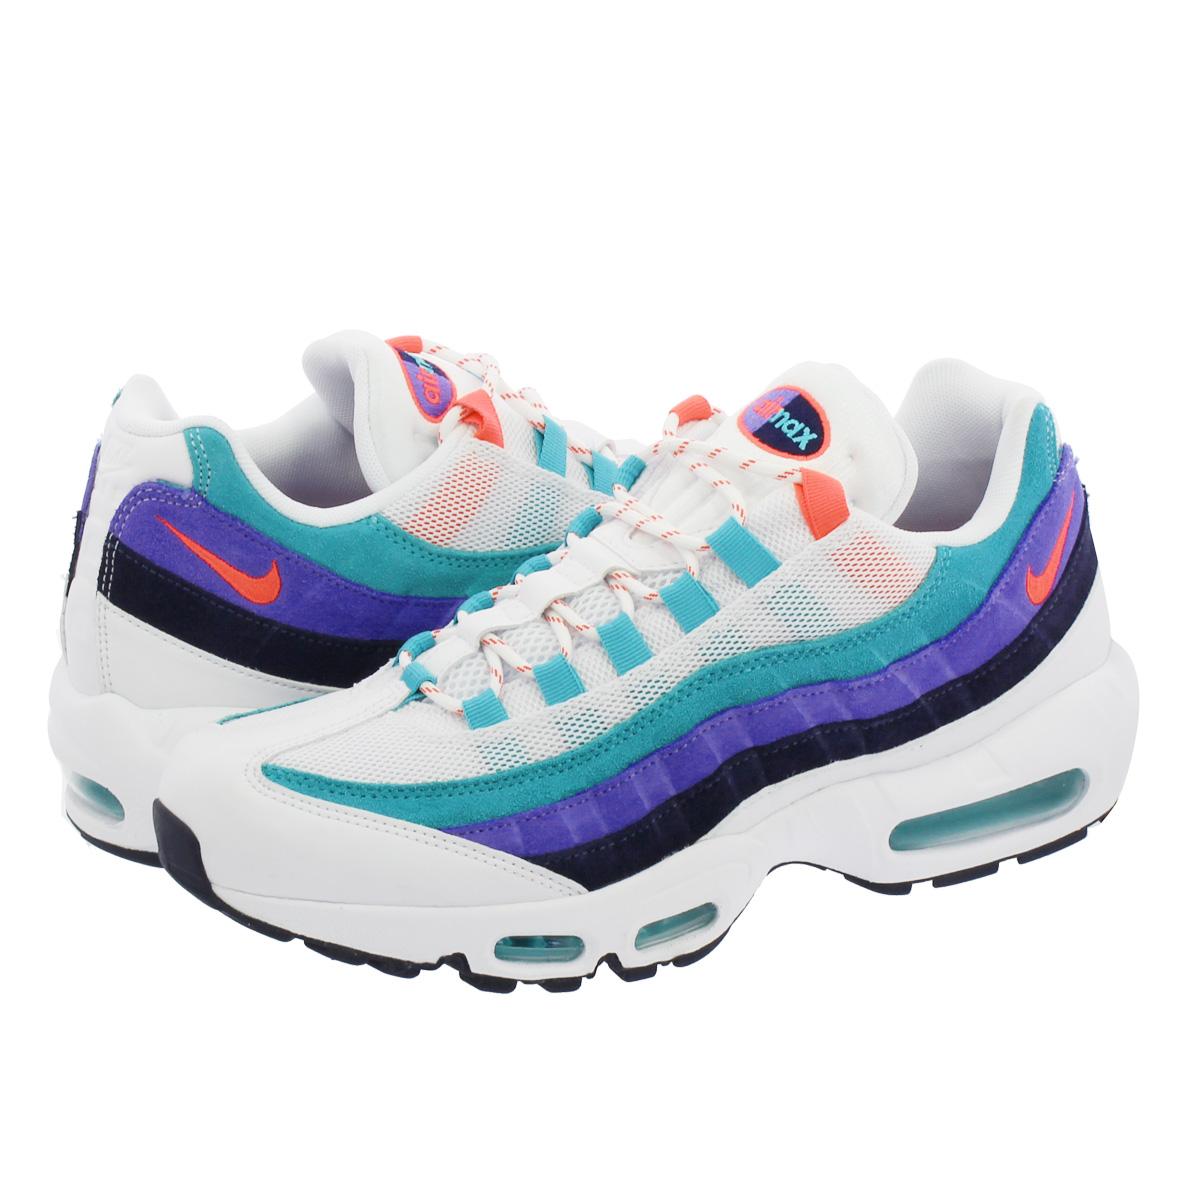 cheap for discount f8b64 a4ec1 Nike Air Max 95 Essential Ultramarine White Black Solar Red 749766 106 DW  Clothing, Shoes   Accessories Football